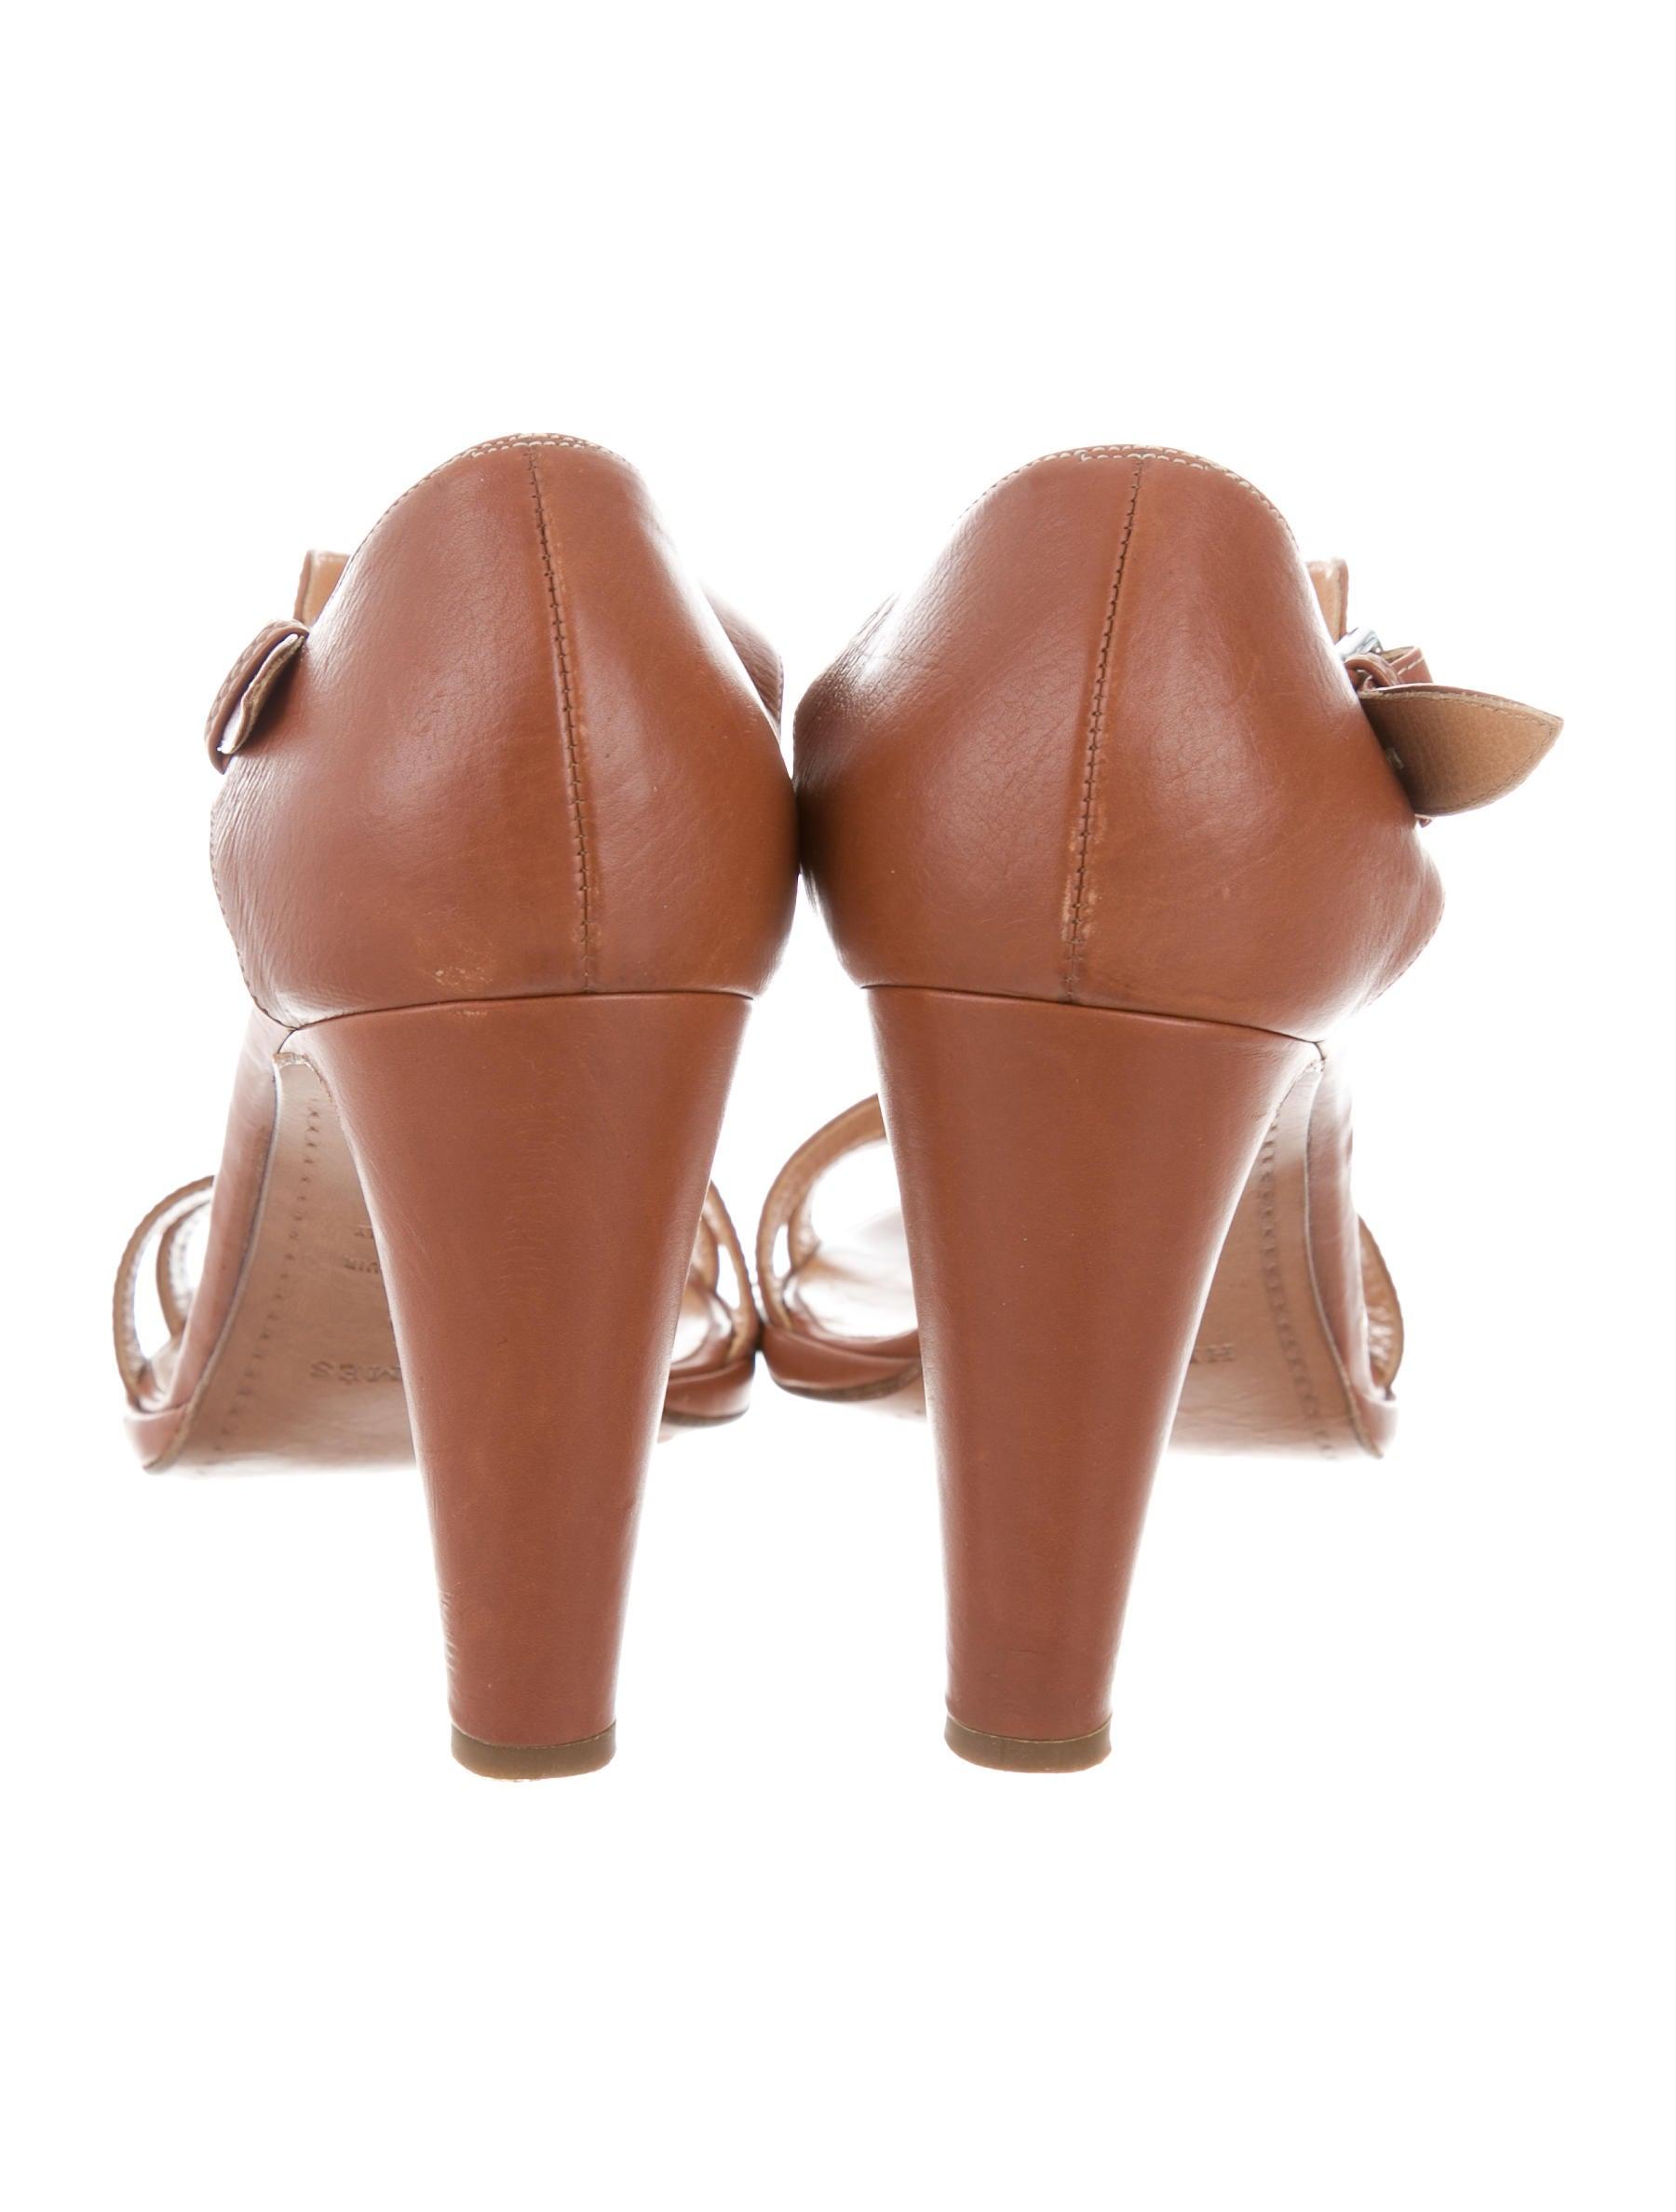 hermes women shoes - photo #38